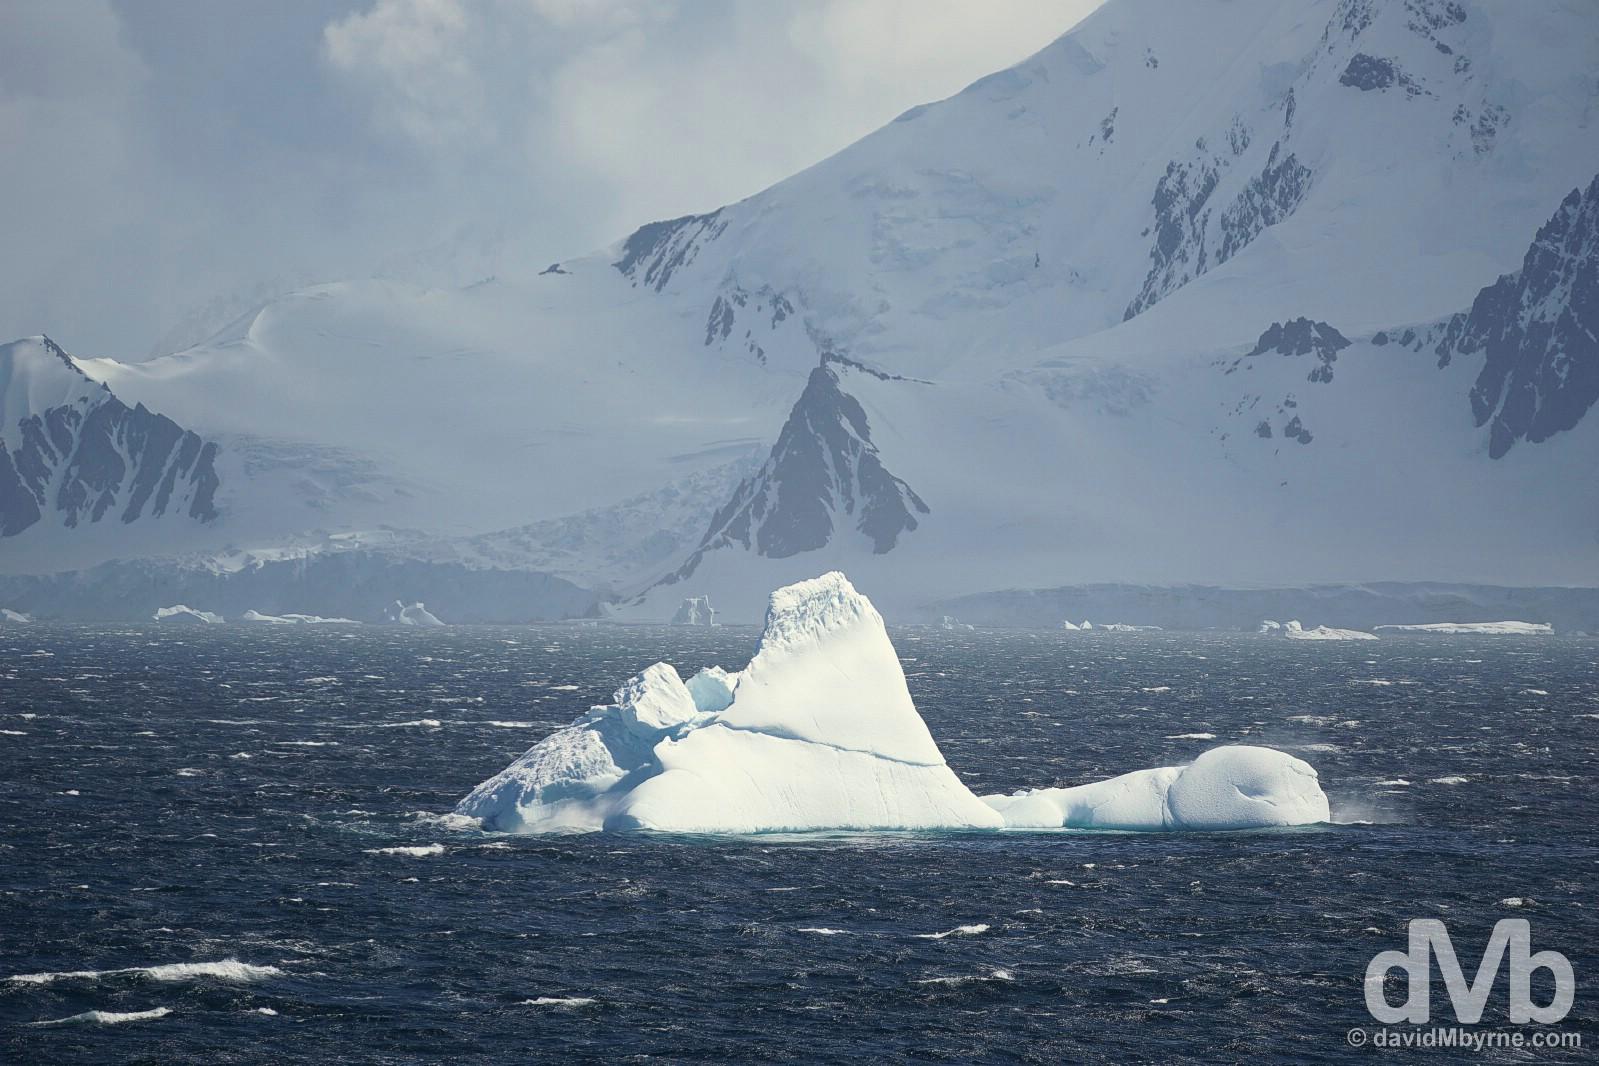 An iceberg in the windswept Bransfield Strait, Antarctica. November 29, 2015.